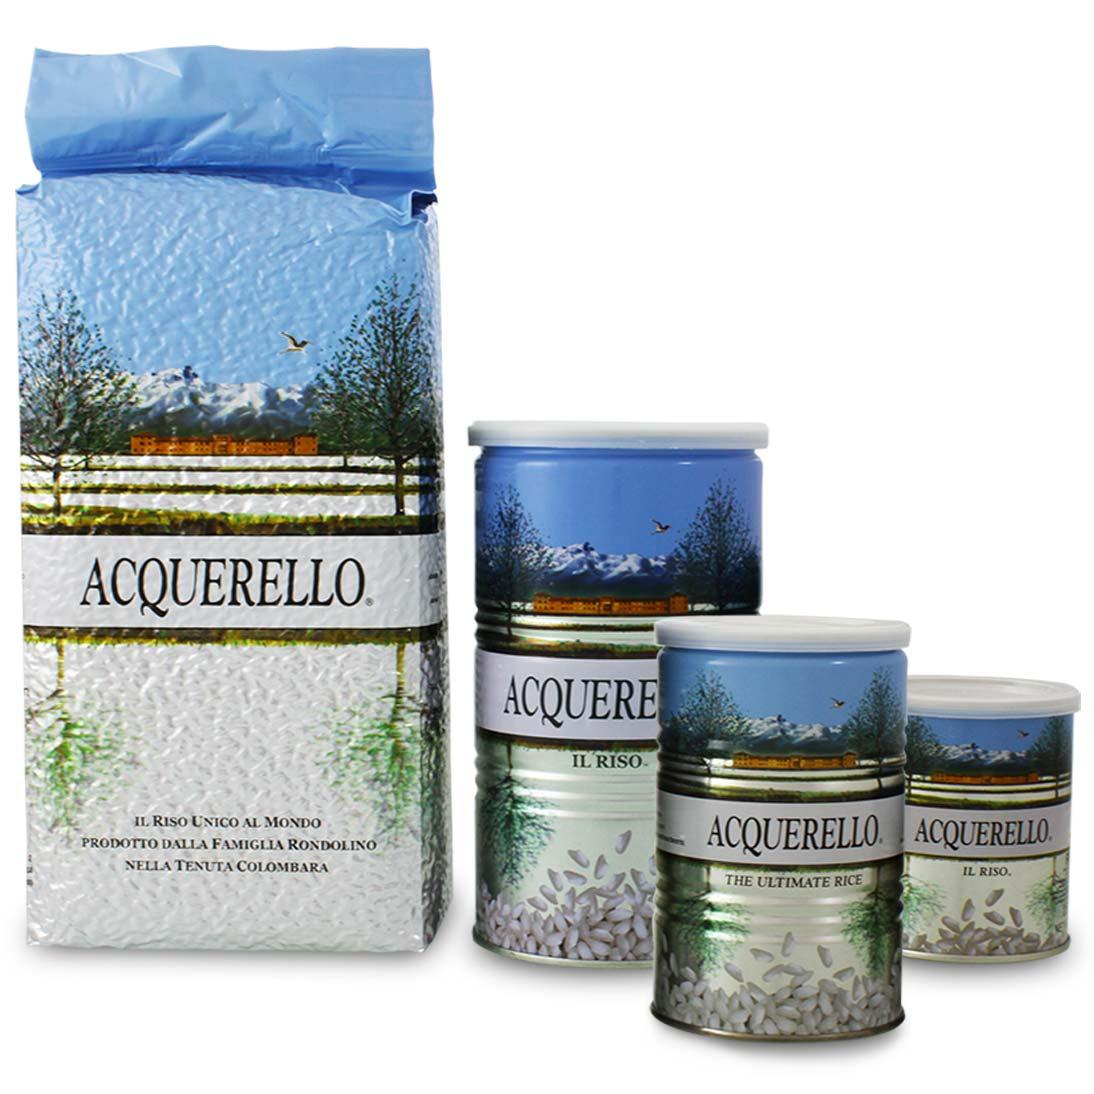 acquerello-aged-carnaroli-rice1.jpg